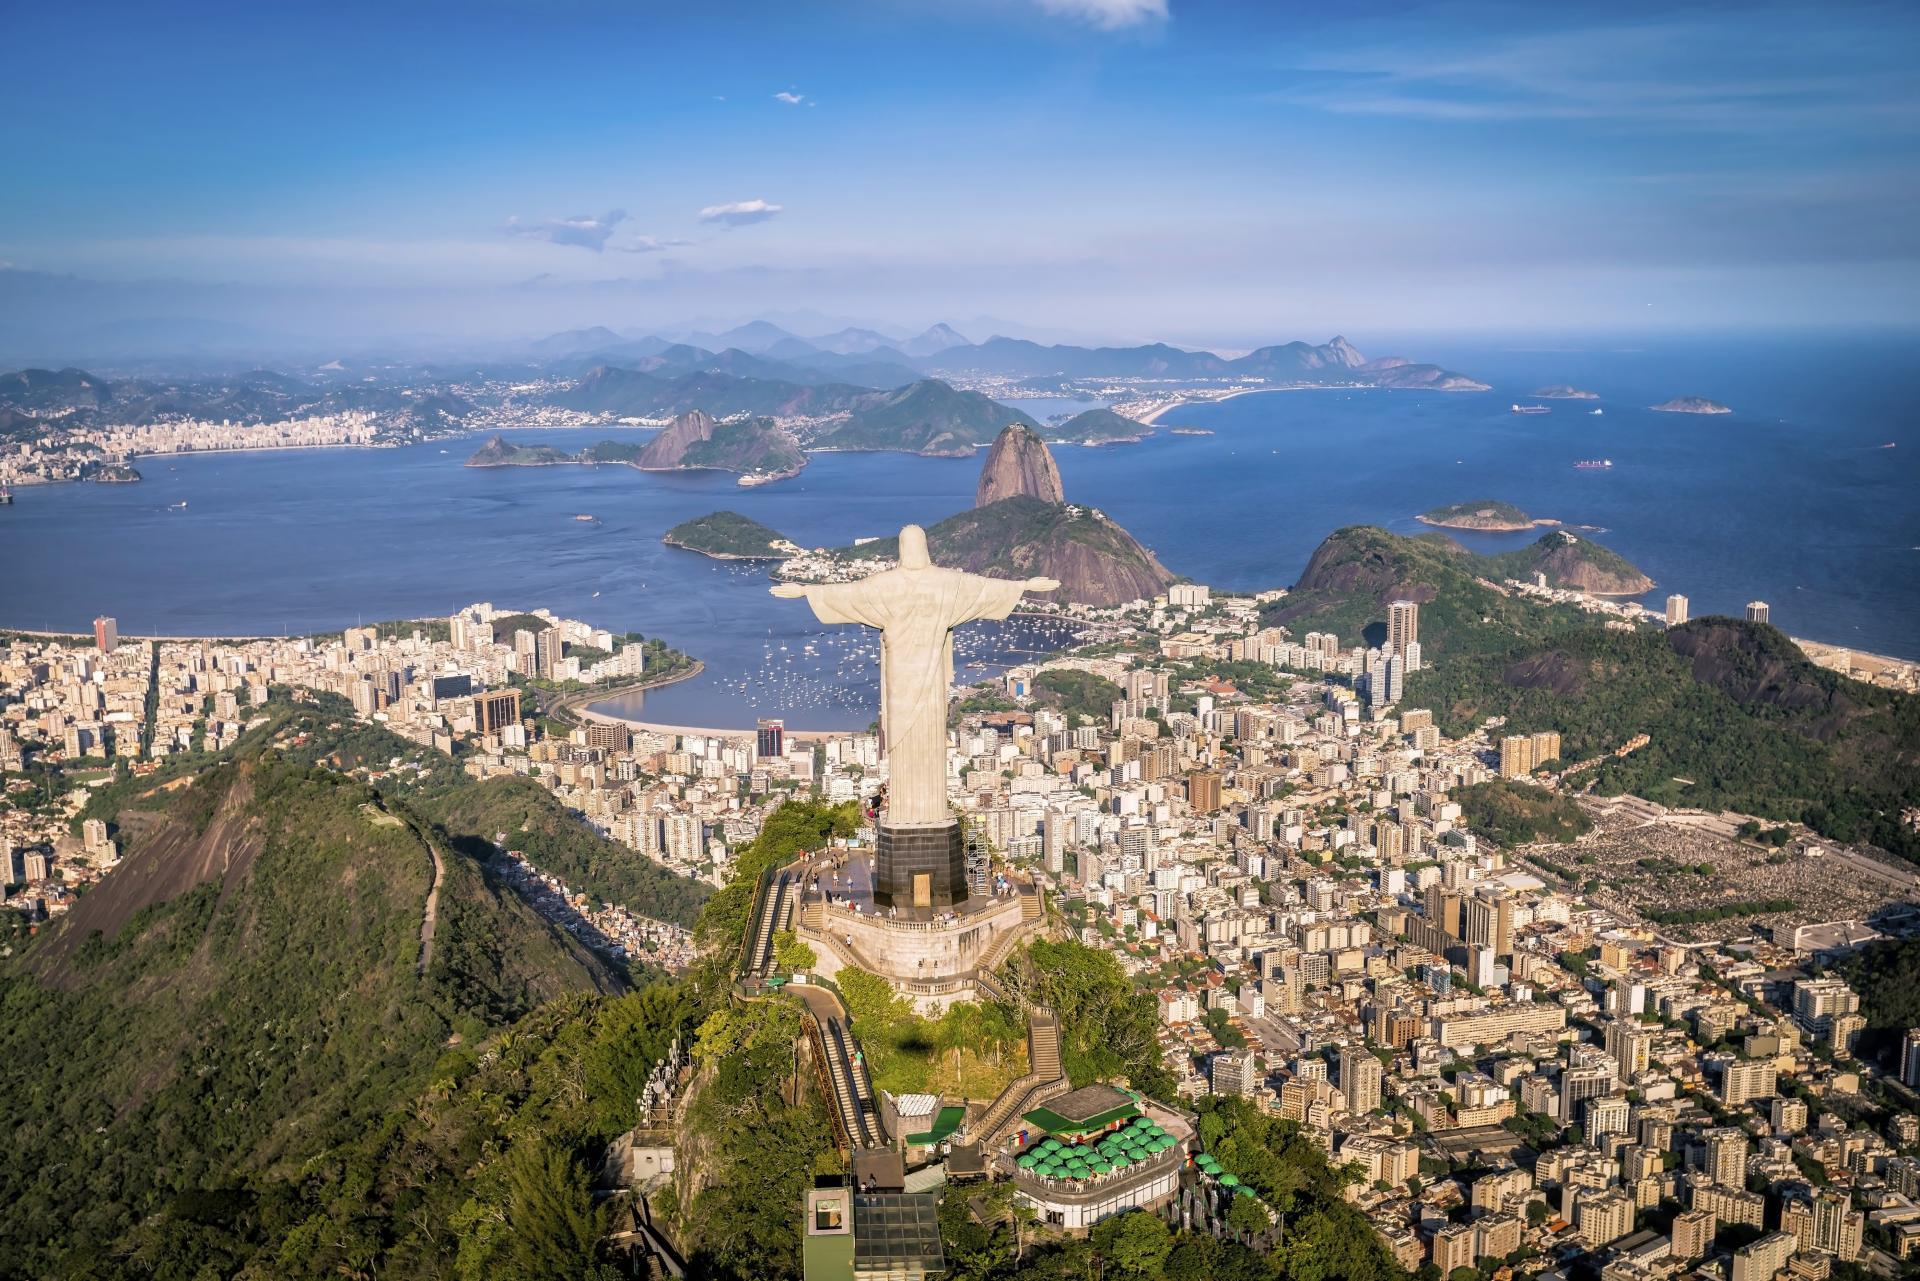 Tagestour Corcovado & Trekking Tijuca Nationalpark (7h, privat): Aussicht auf Rio